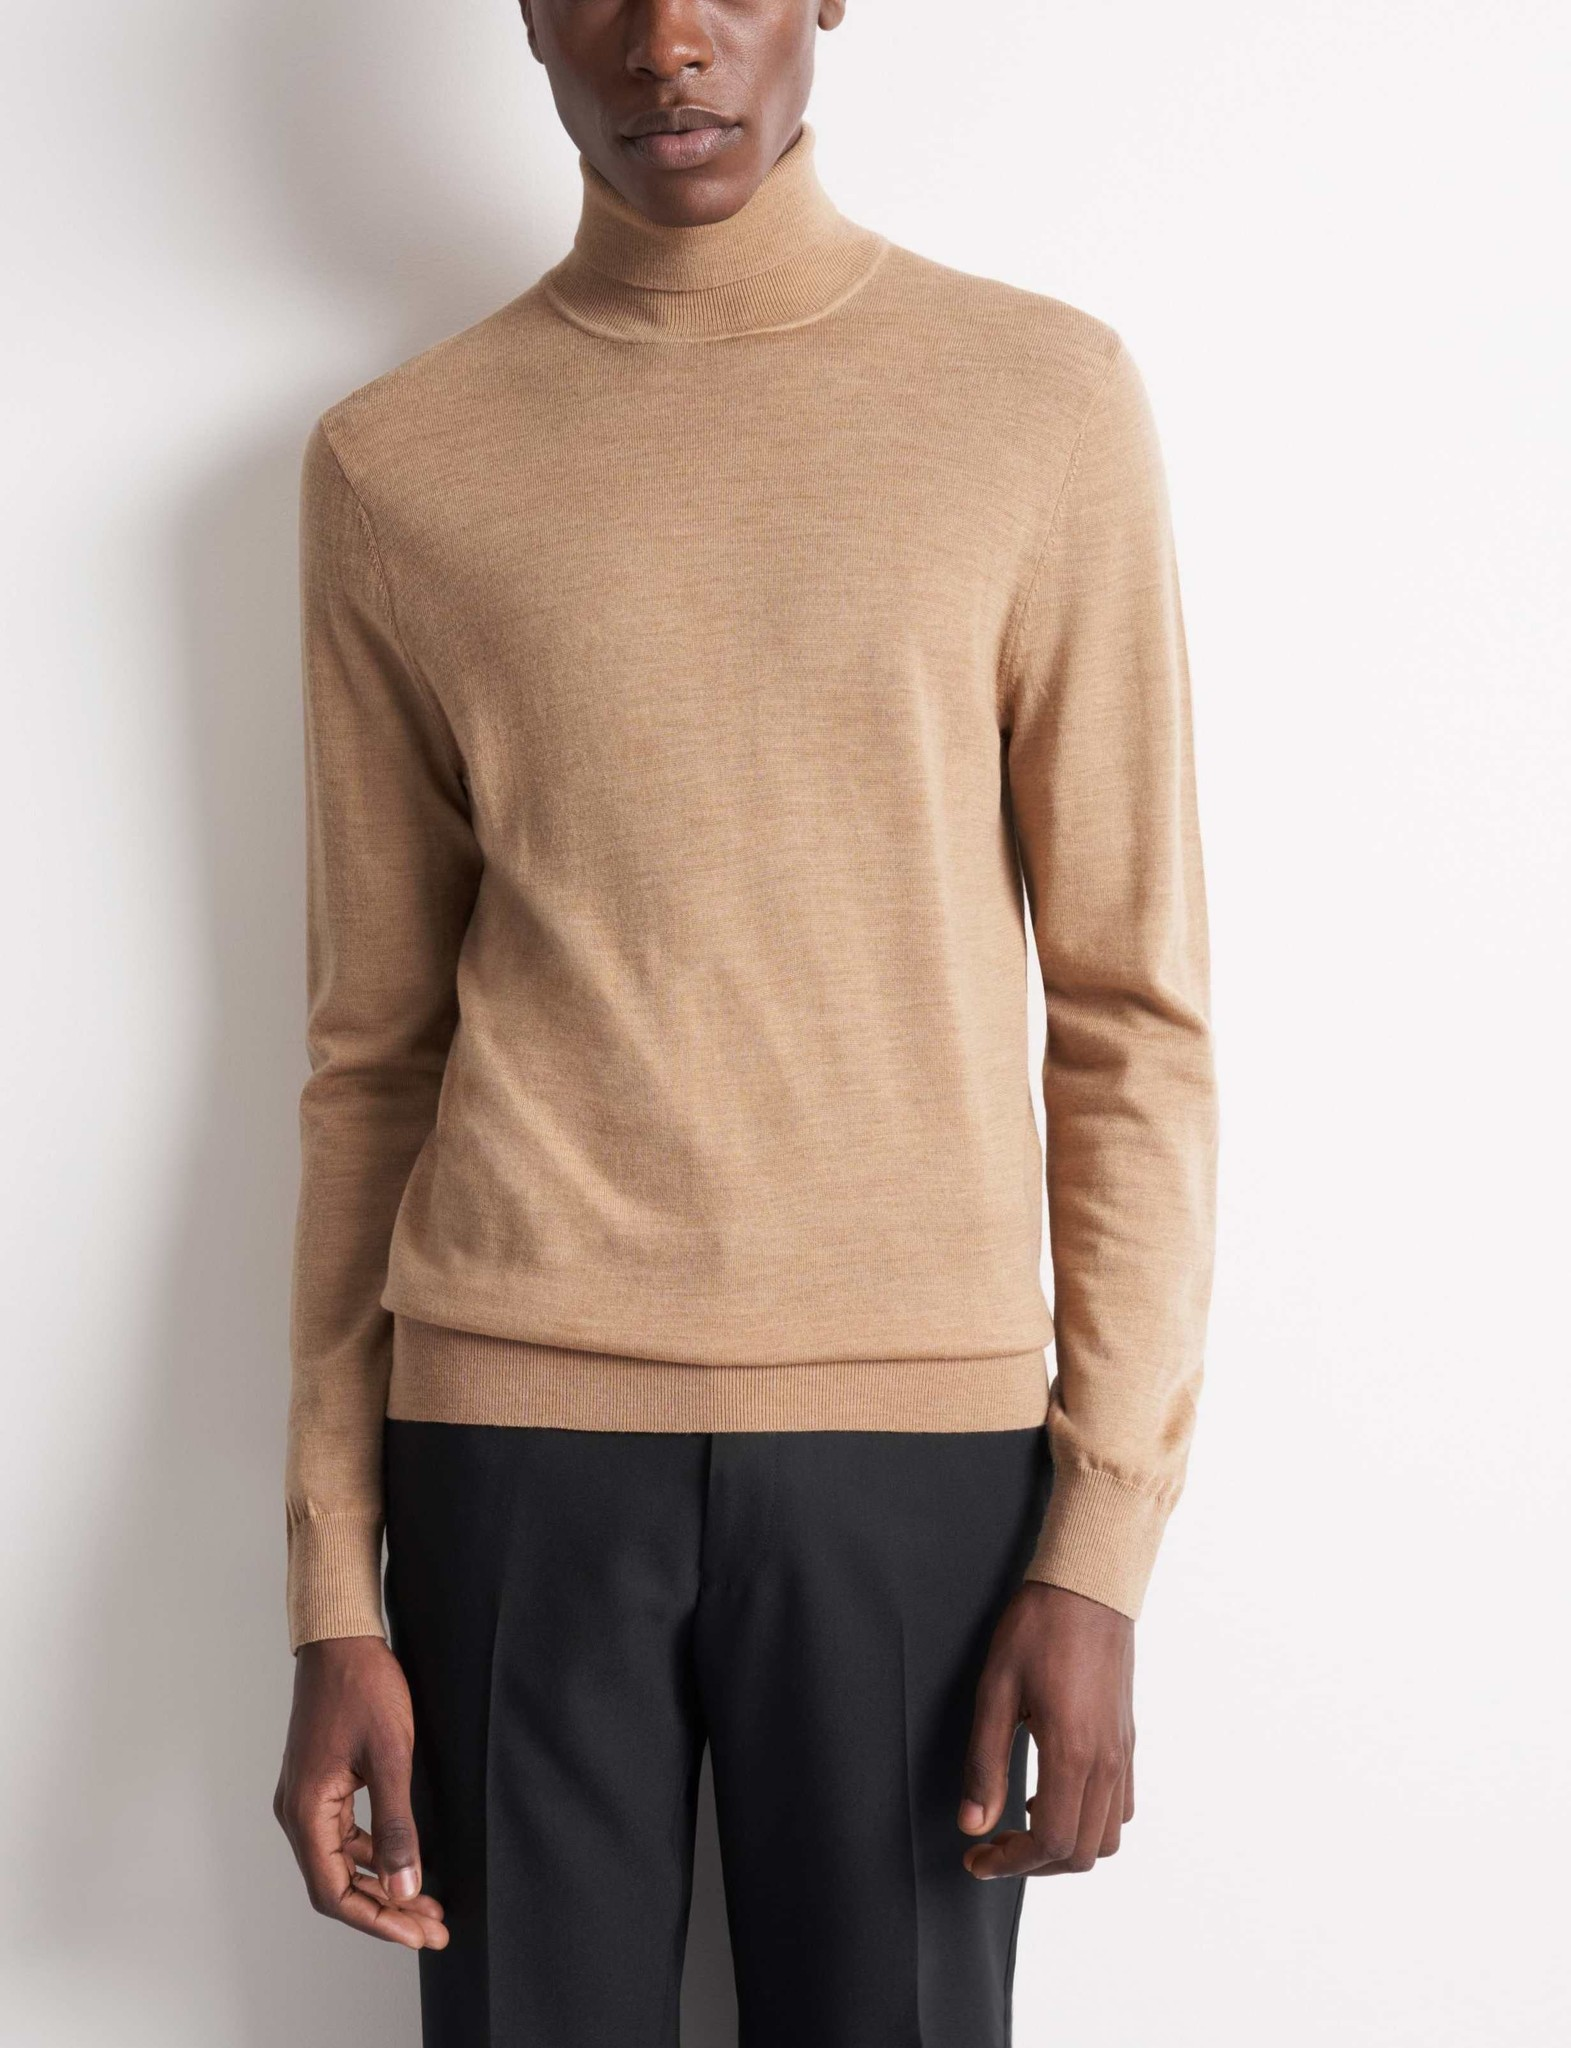 Nevile Macchiato Brown Turtle Neck Wool-1